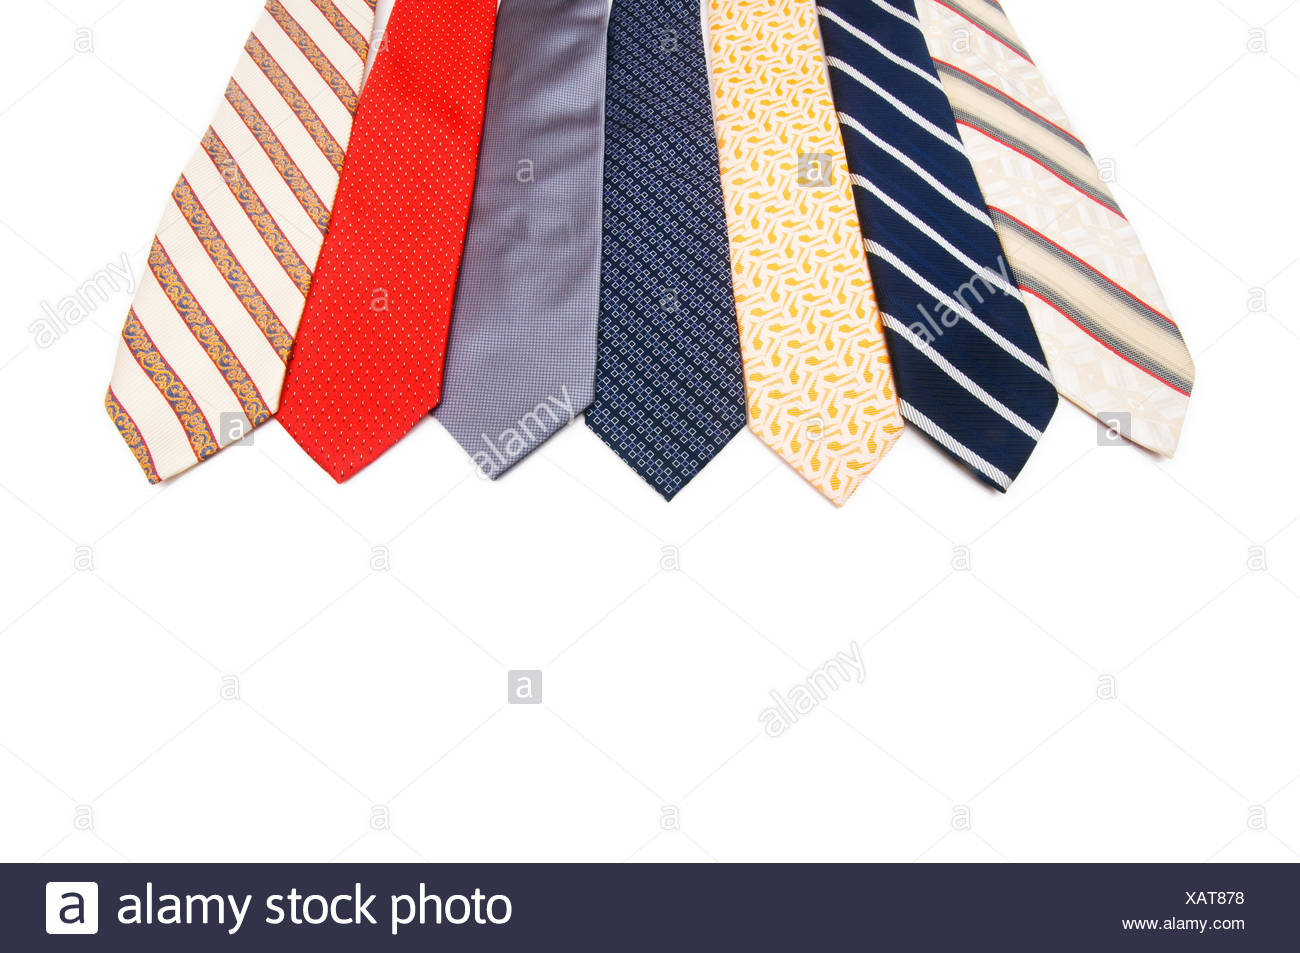 men, man, object, macro, close-up, macro admission, close up view, single, - Stock Image